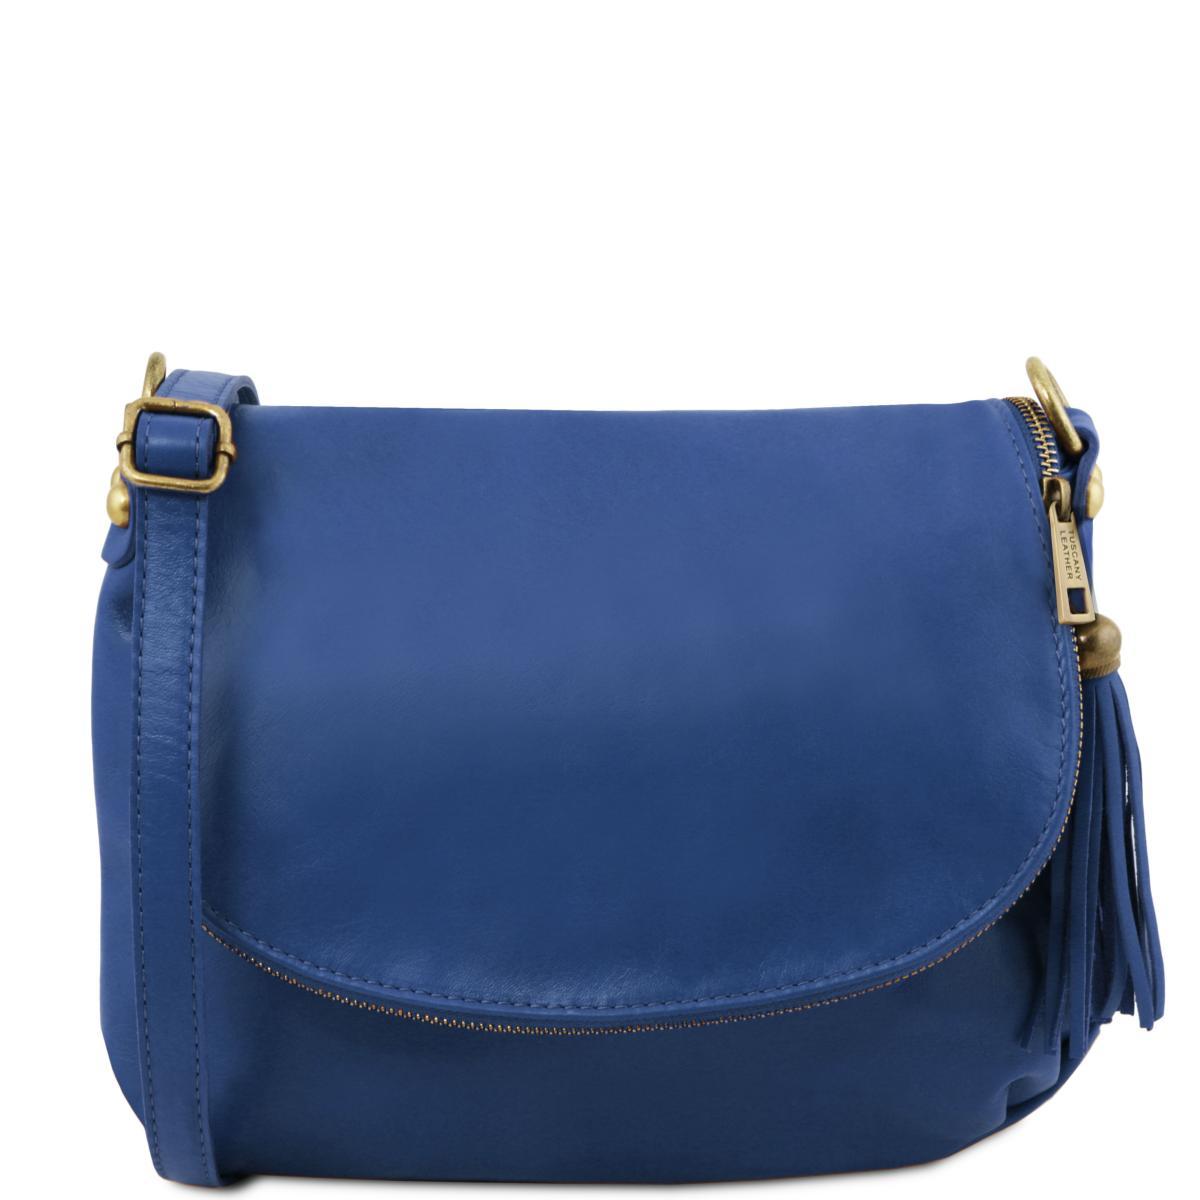 Sac Bandoulière Cuir Besace Femme Bleu -Tuscany Leather- Bleu